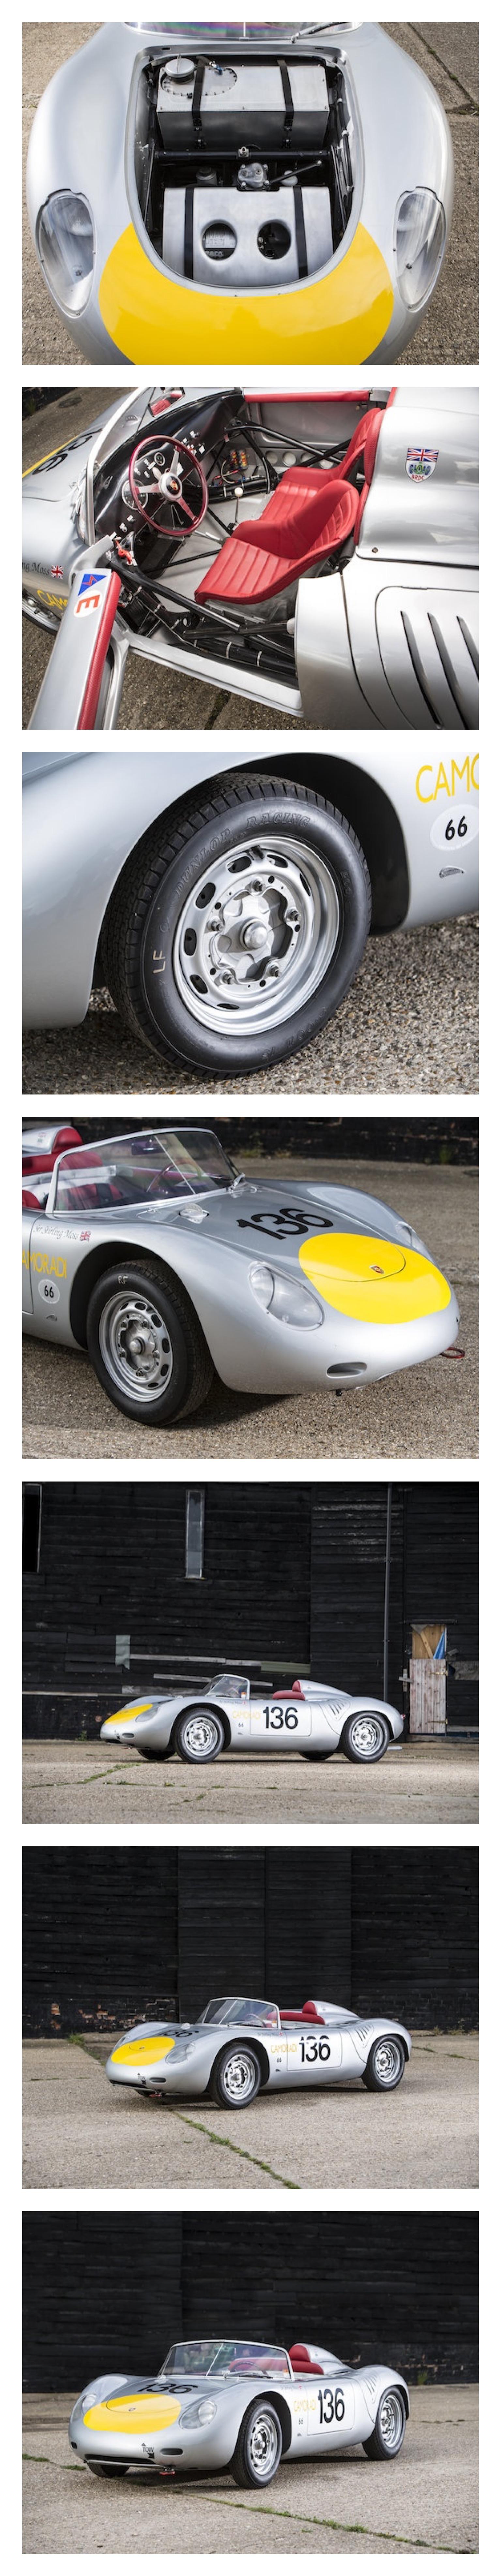 Porsche Rennsport おしゃれまとめの人気アイデア Pinterest Jarad